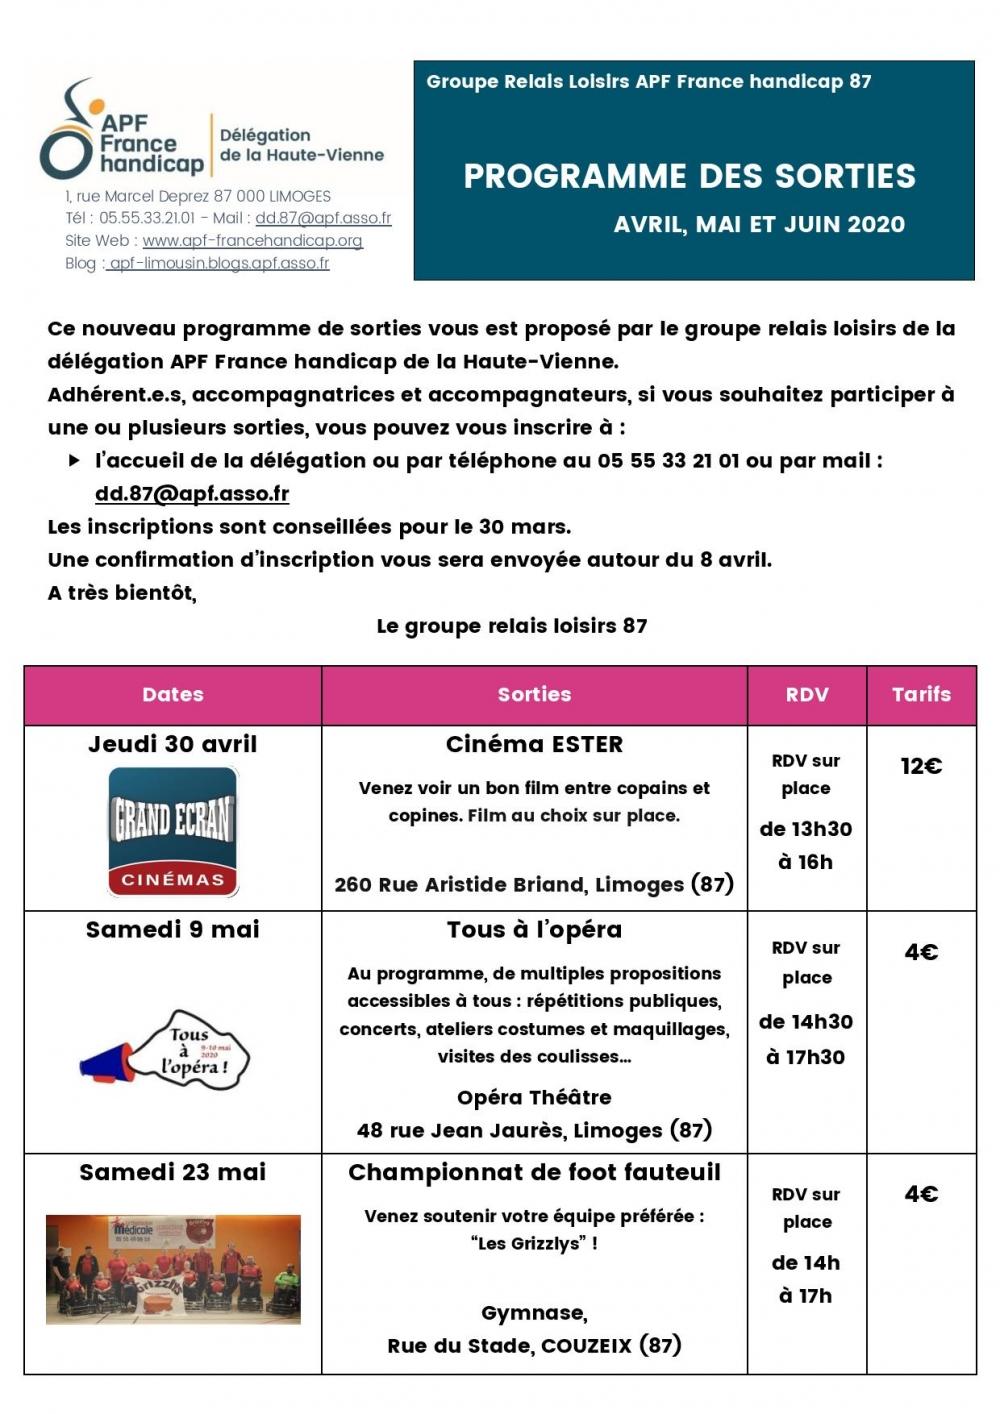 programme AVRIL MAI JUIN 2020 REV Anna-page-001.jpg